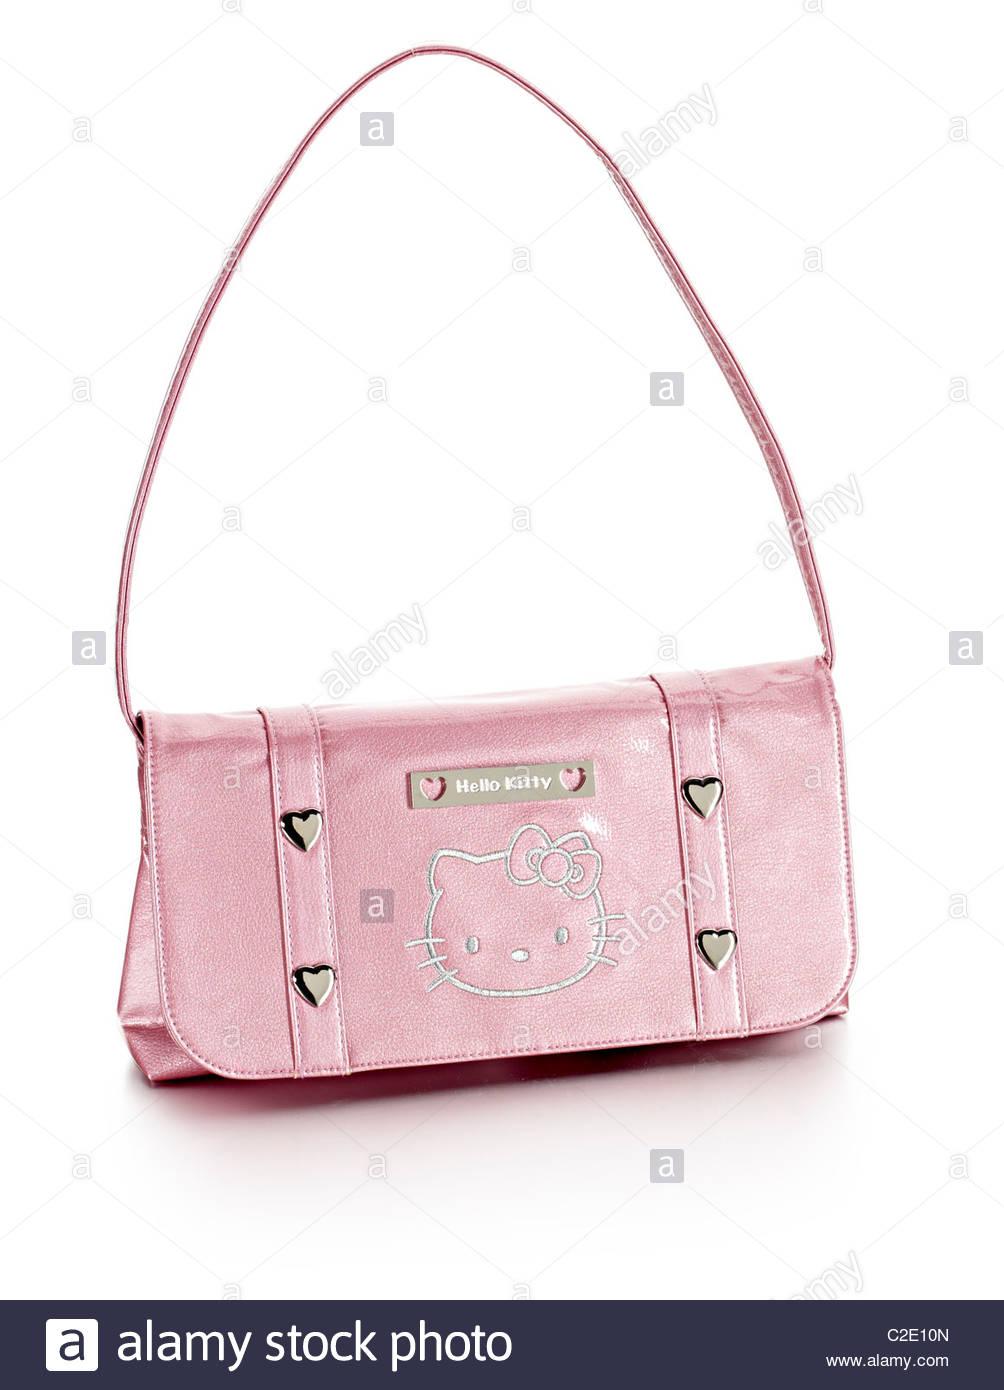 Hello Kitty shoulder bag - Stock Image